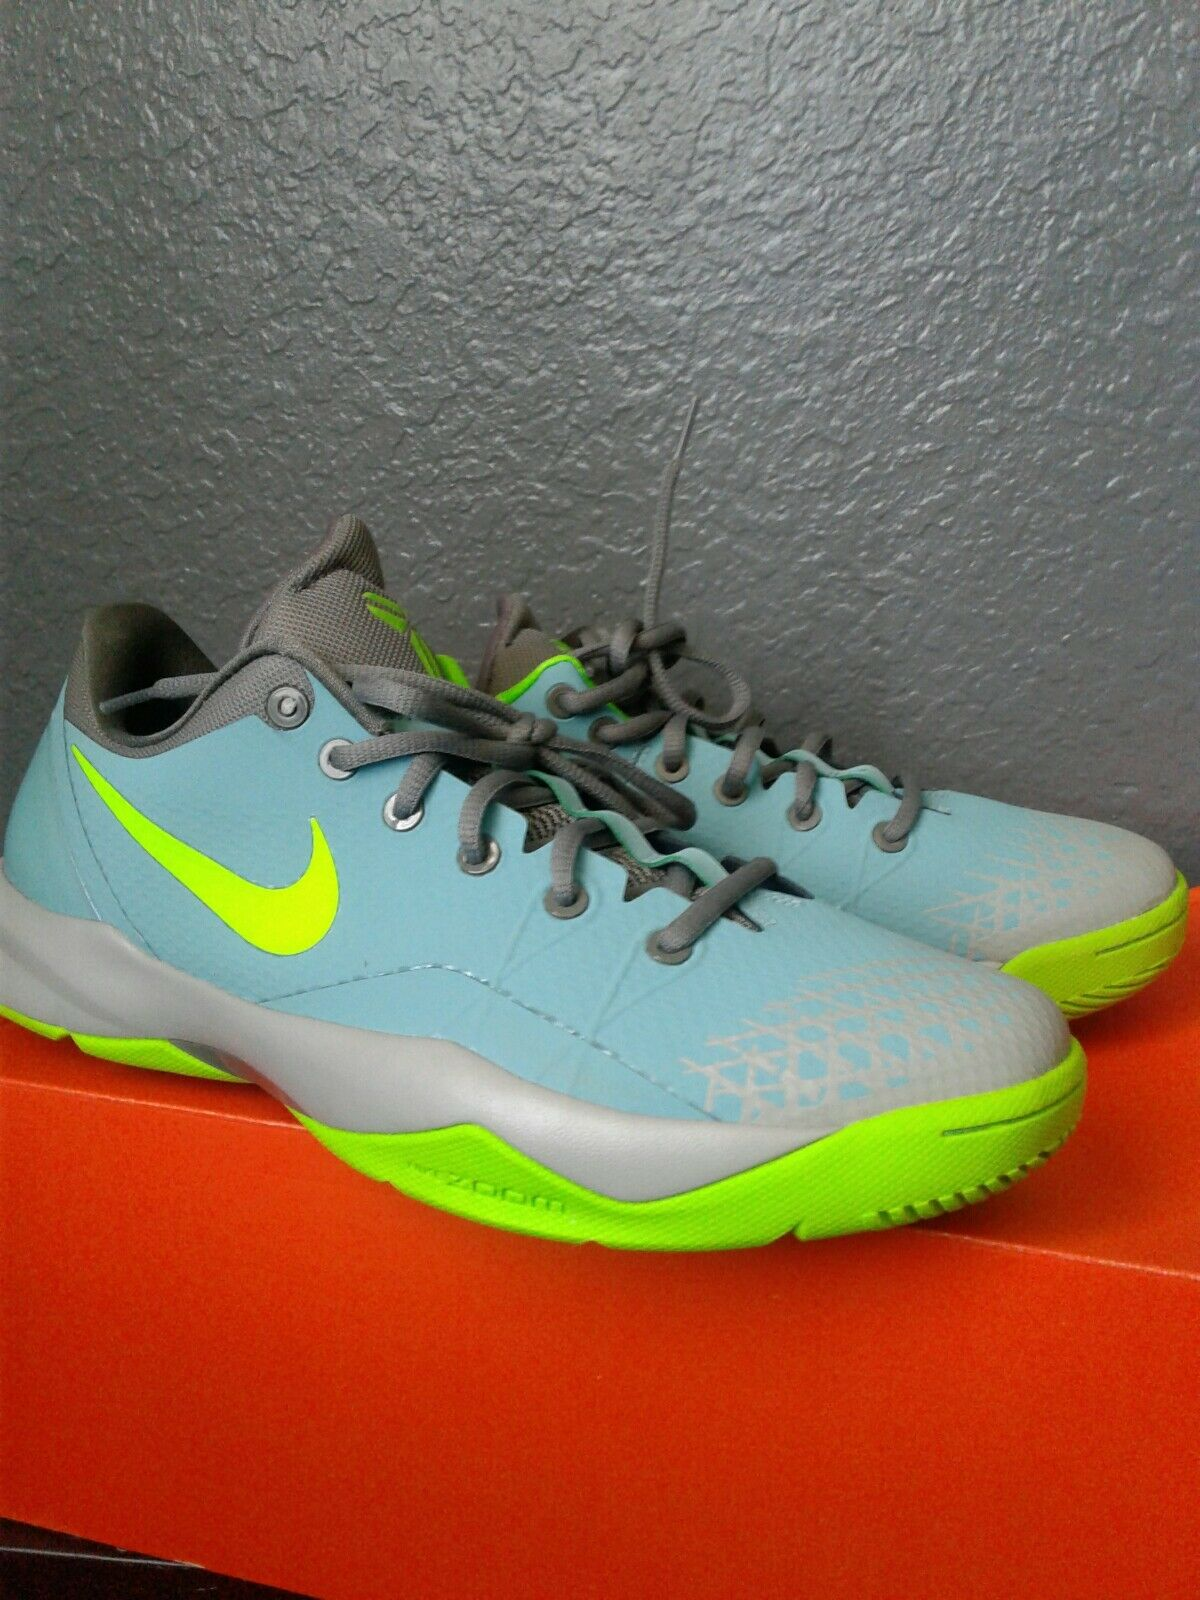 Nike Zoom Kobe Zapatos Bryant, los Angeles Lakers basketball Zapatos Kobe Tamaño Hombre a53243